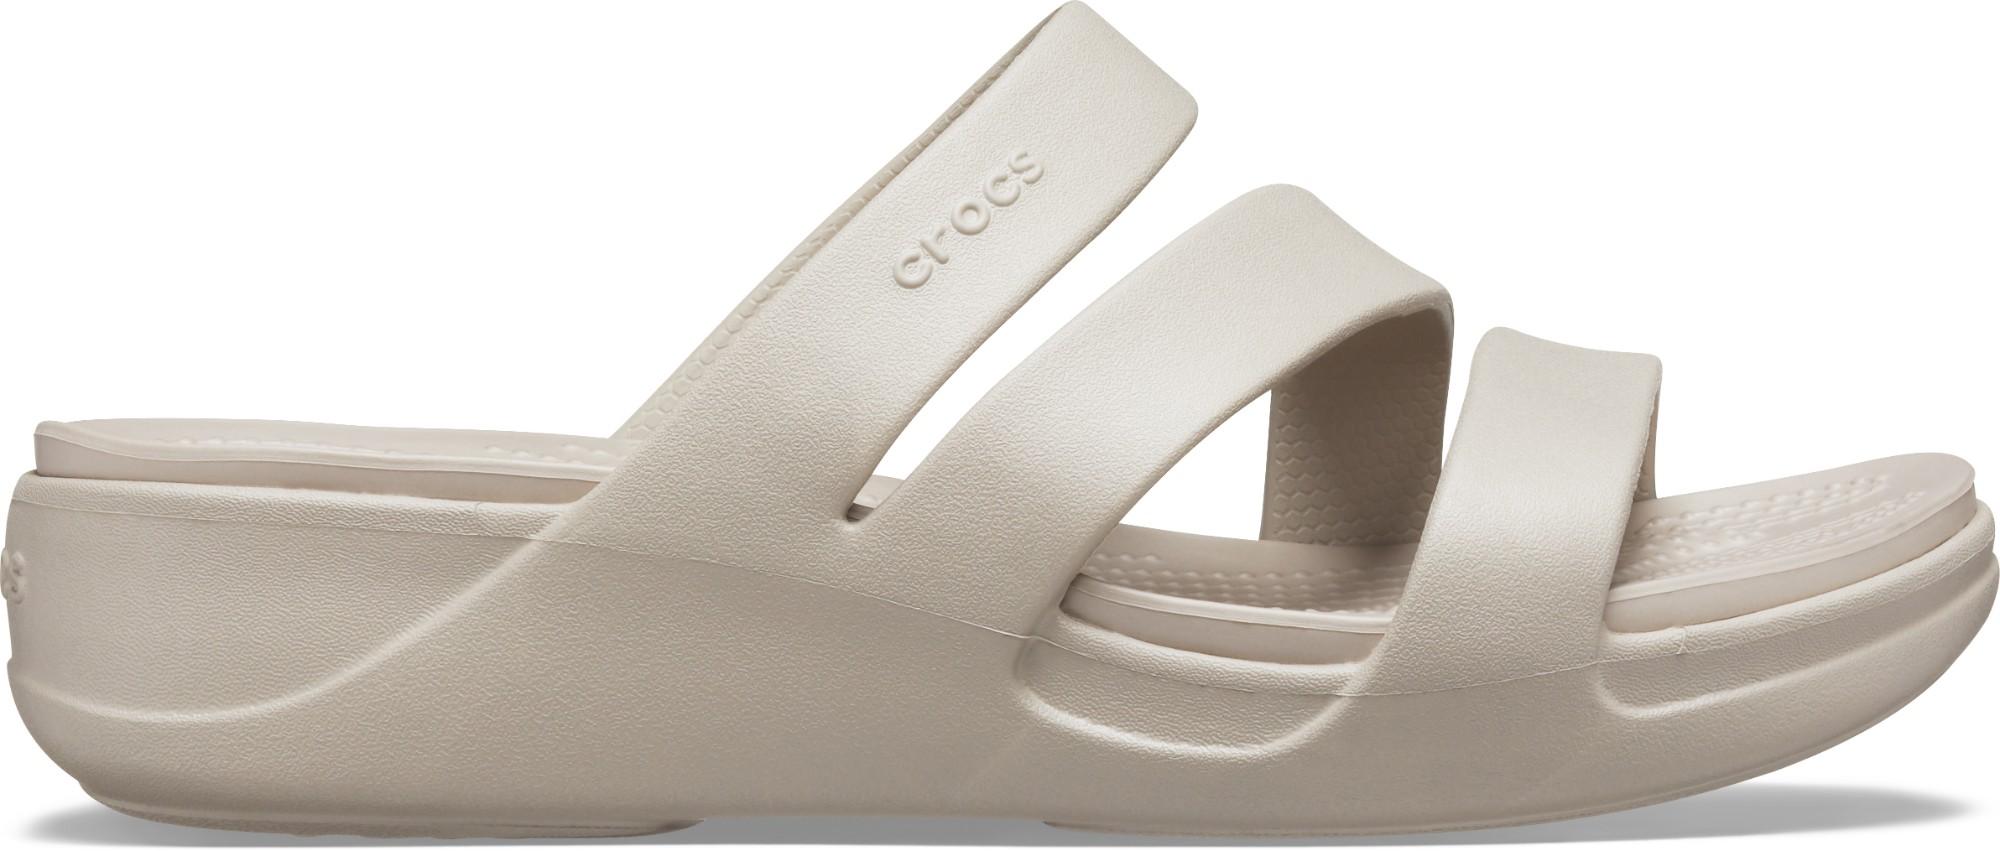 Crocs™ Monterey Wedge Womens Platinum 37,5